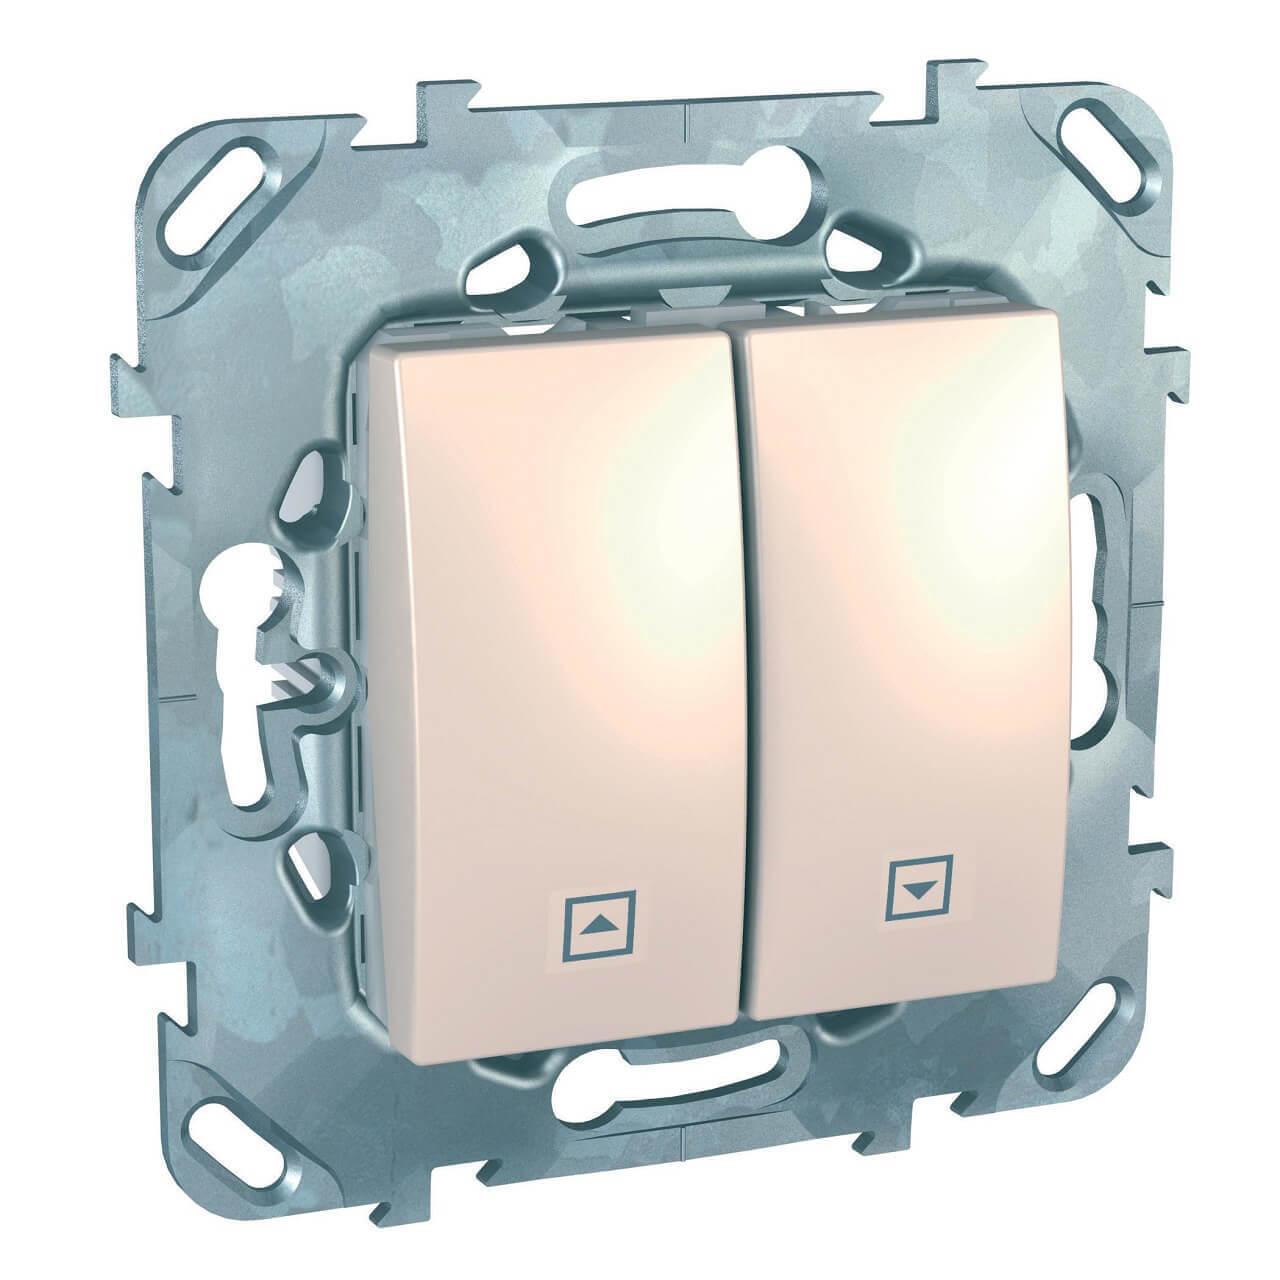 Выключатель двухклавишный для жалюзи Schneider Electric Unica MGU5.208.25ZD выключатель двухклавишный для жалюзи schneider electric unica mgu5 208 25zd